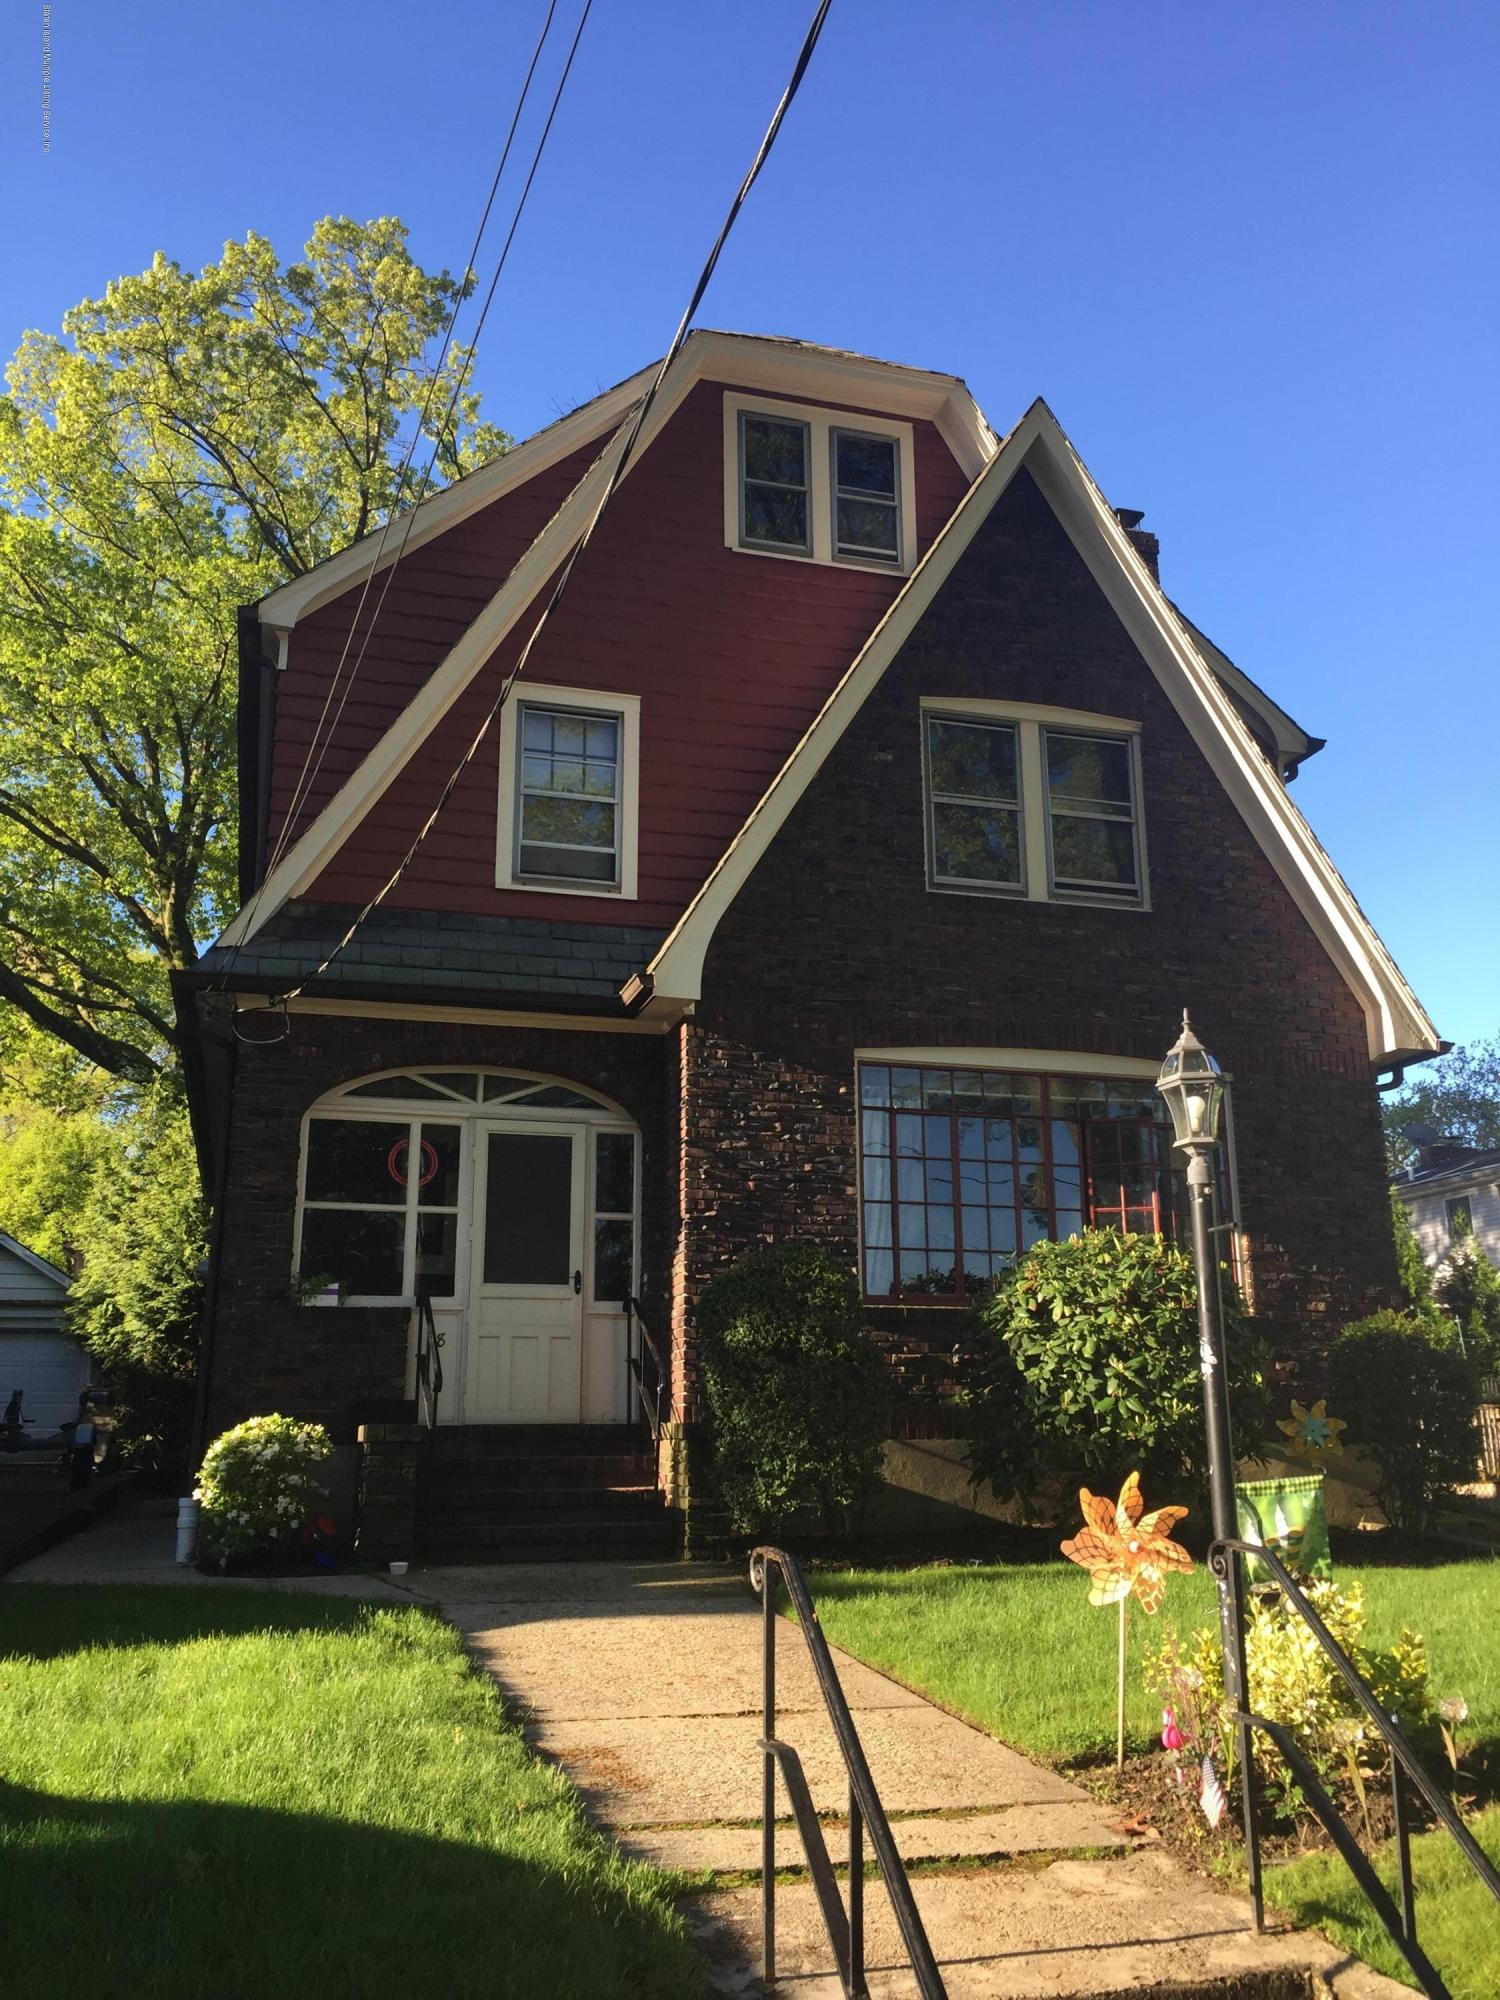 Single Family - Detached 48 Park Court  Staten Island, NY 10301, MLS-1129200-2